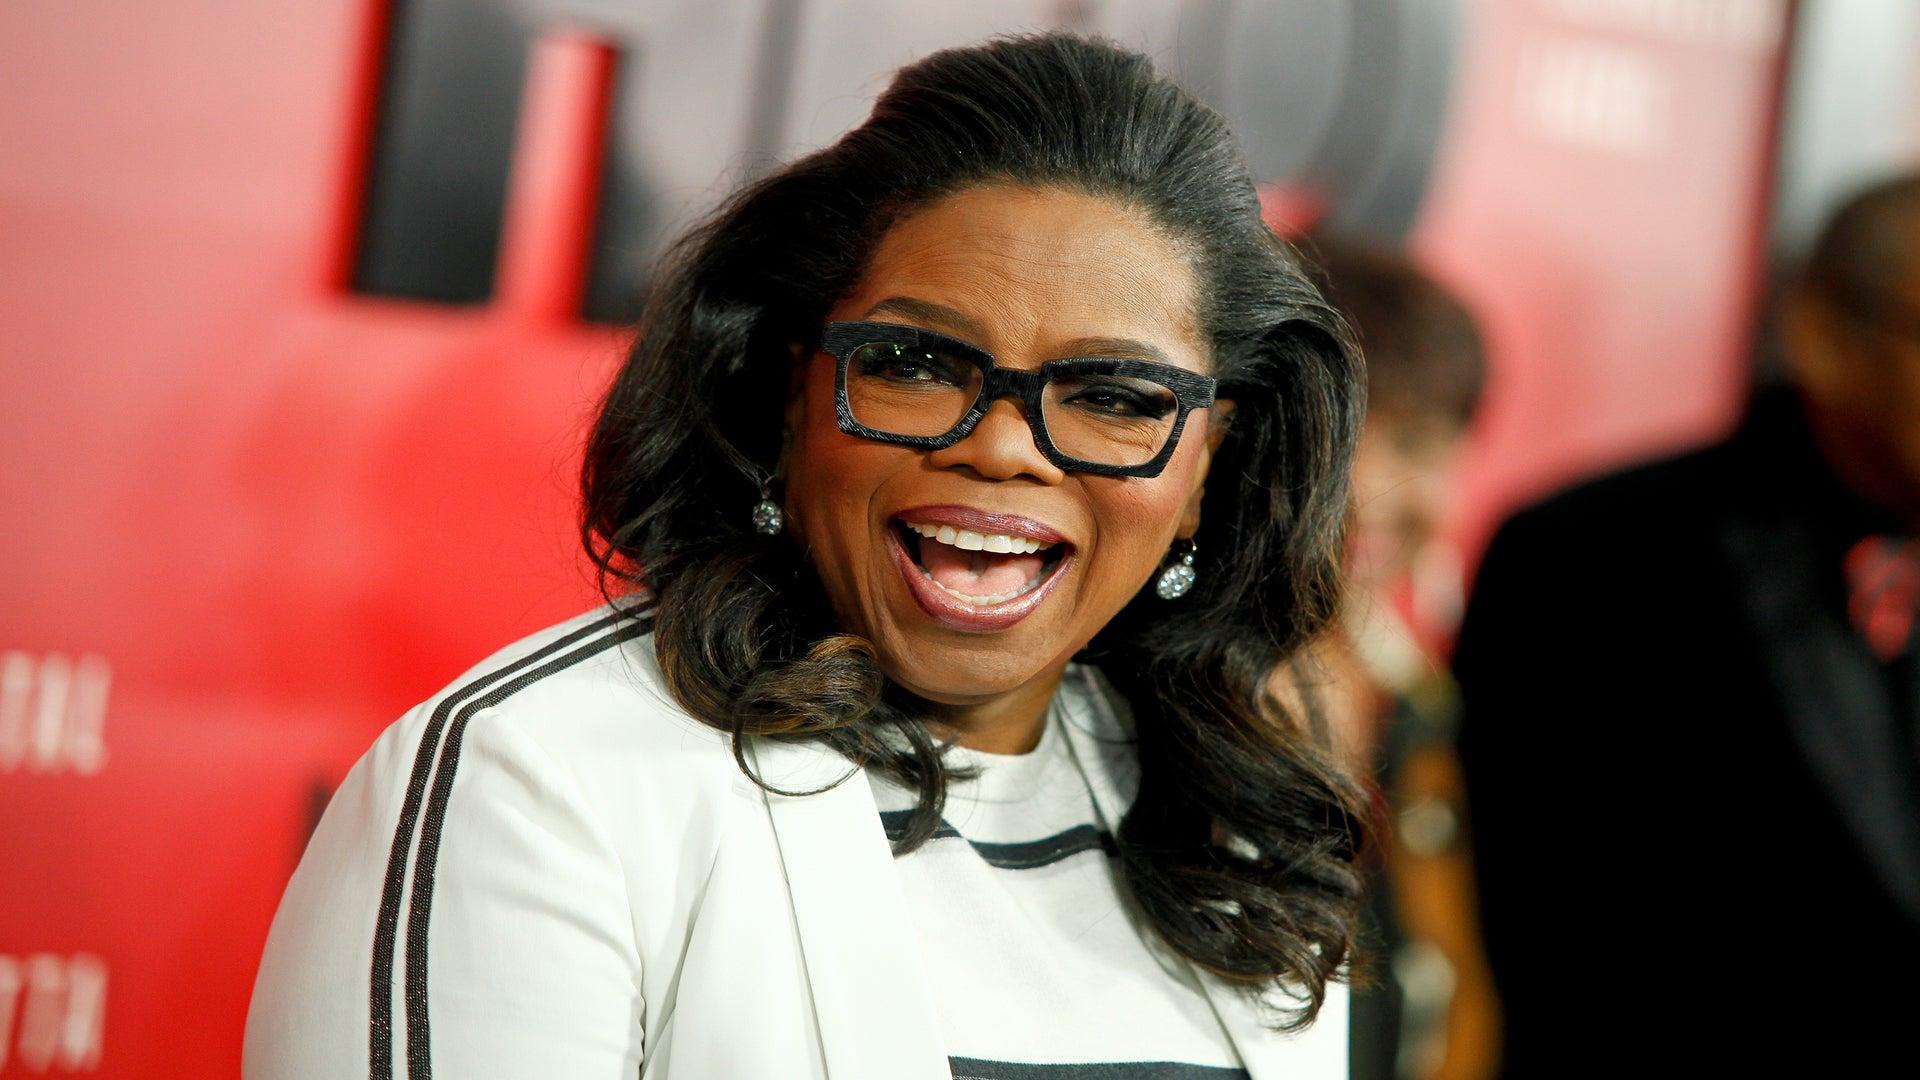 Oprah Winfrey Is Currently Living Her Best Life In Alaska